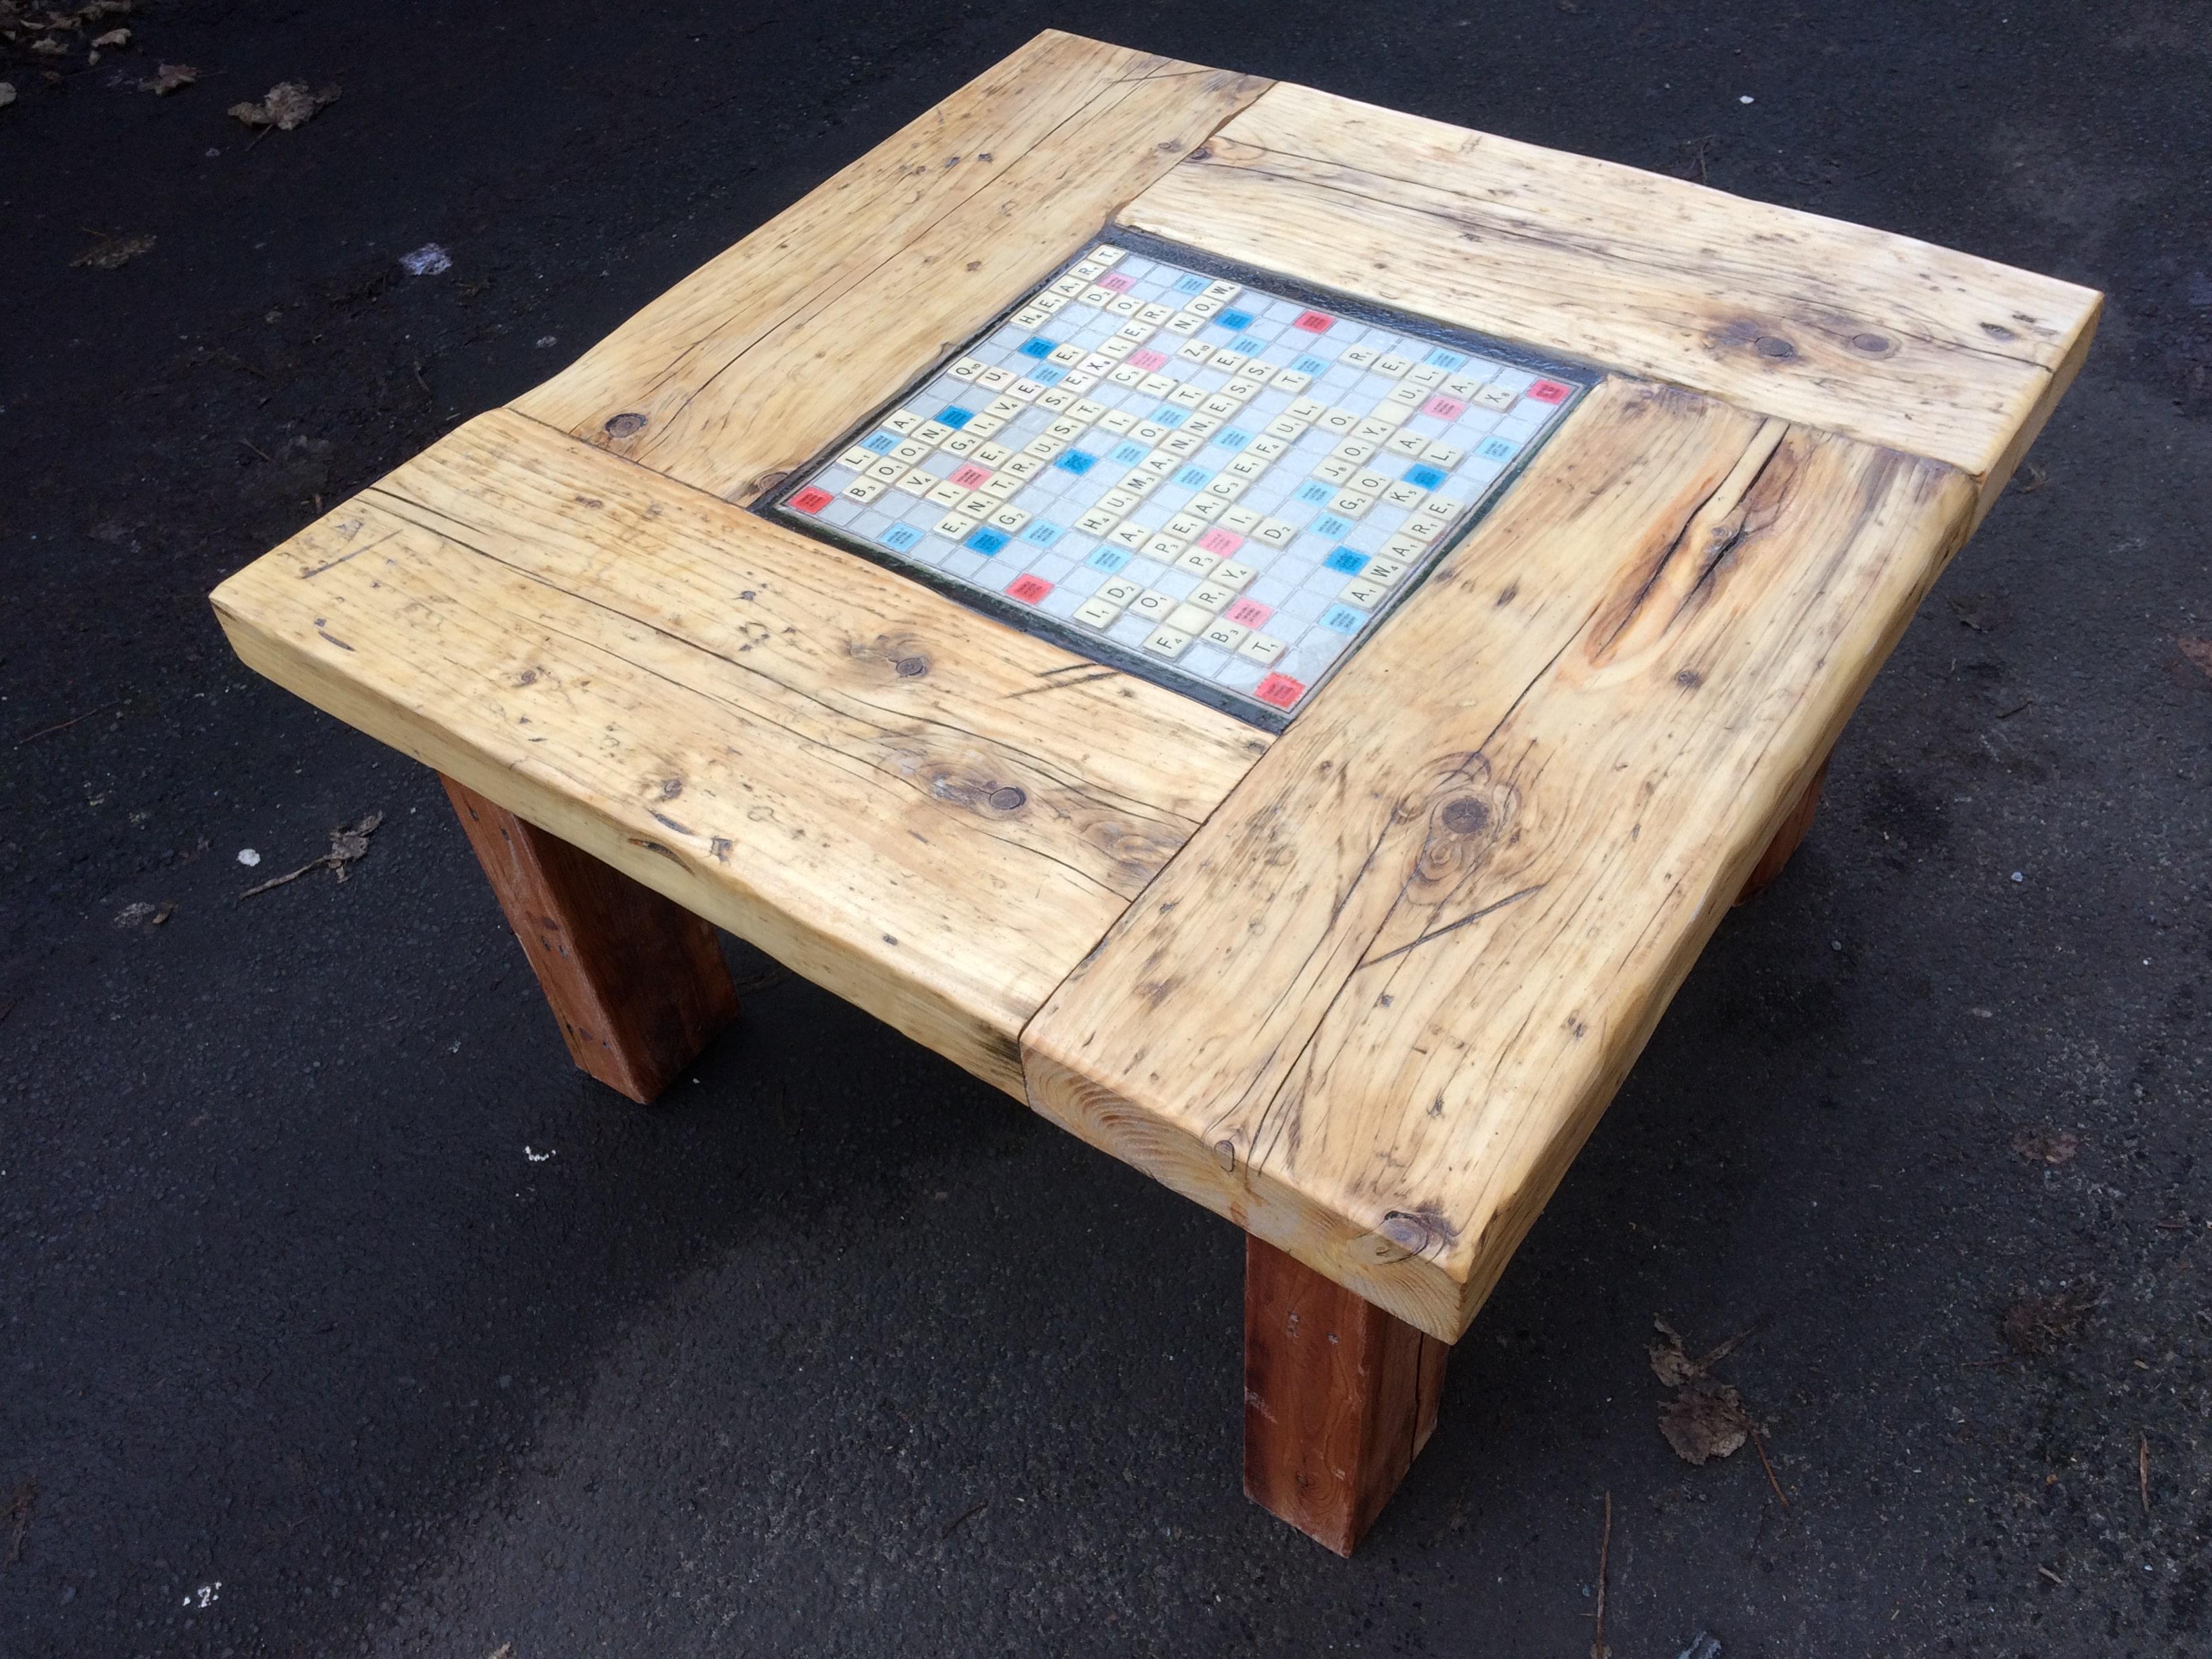 Magnificent Coffee Table Scrabble Inlay Uwap Interior Chair Design Uwaporg